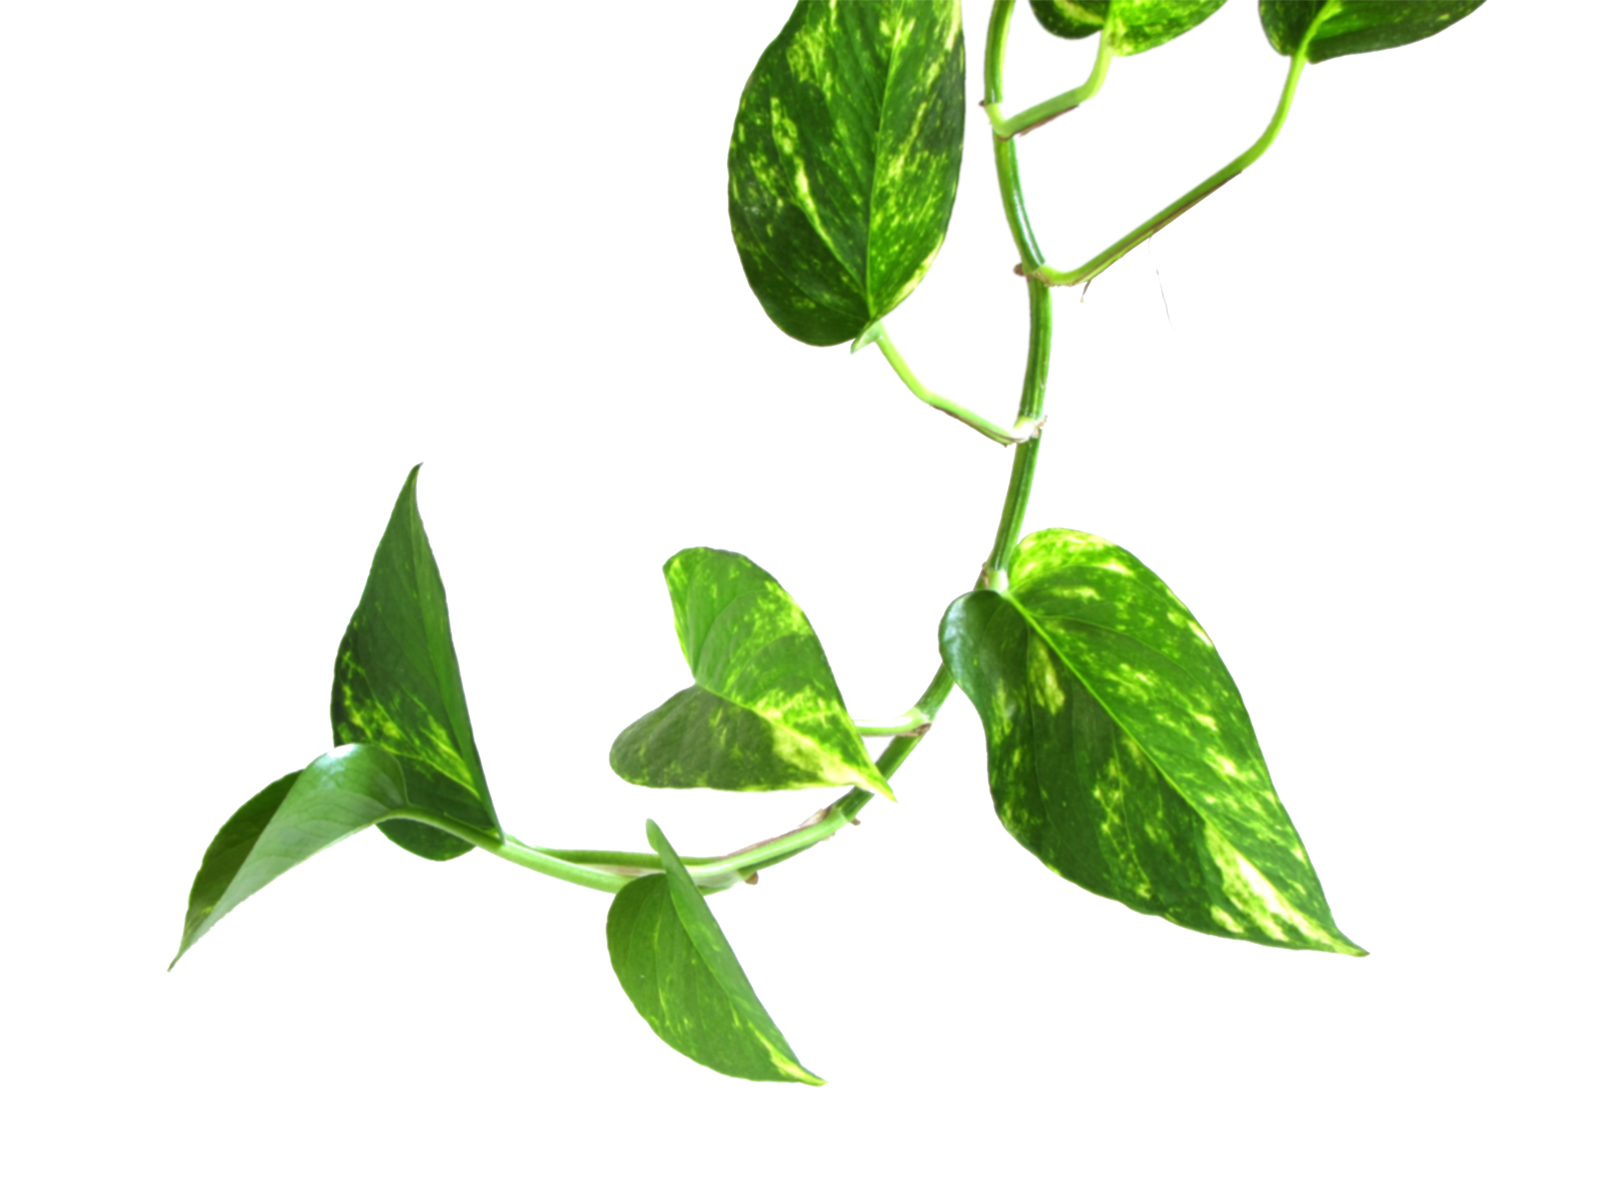 Money plant clipart image stock Vine Money plant leaf transparent image image stock